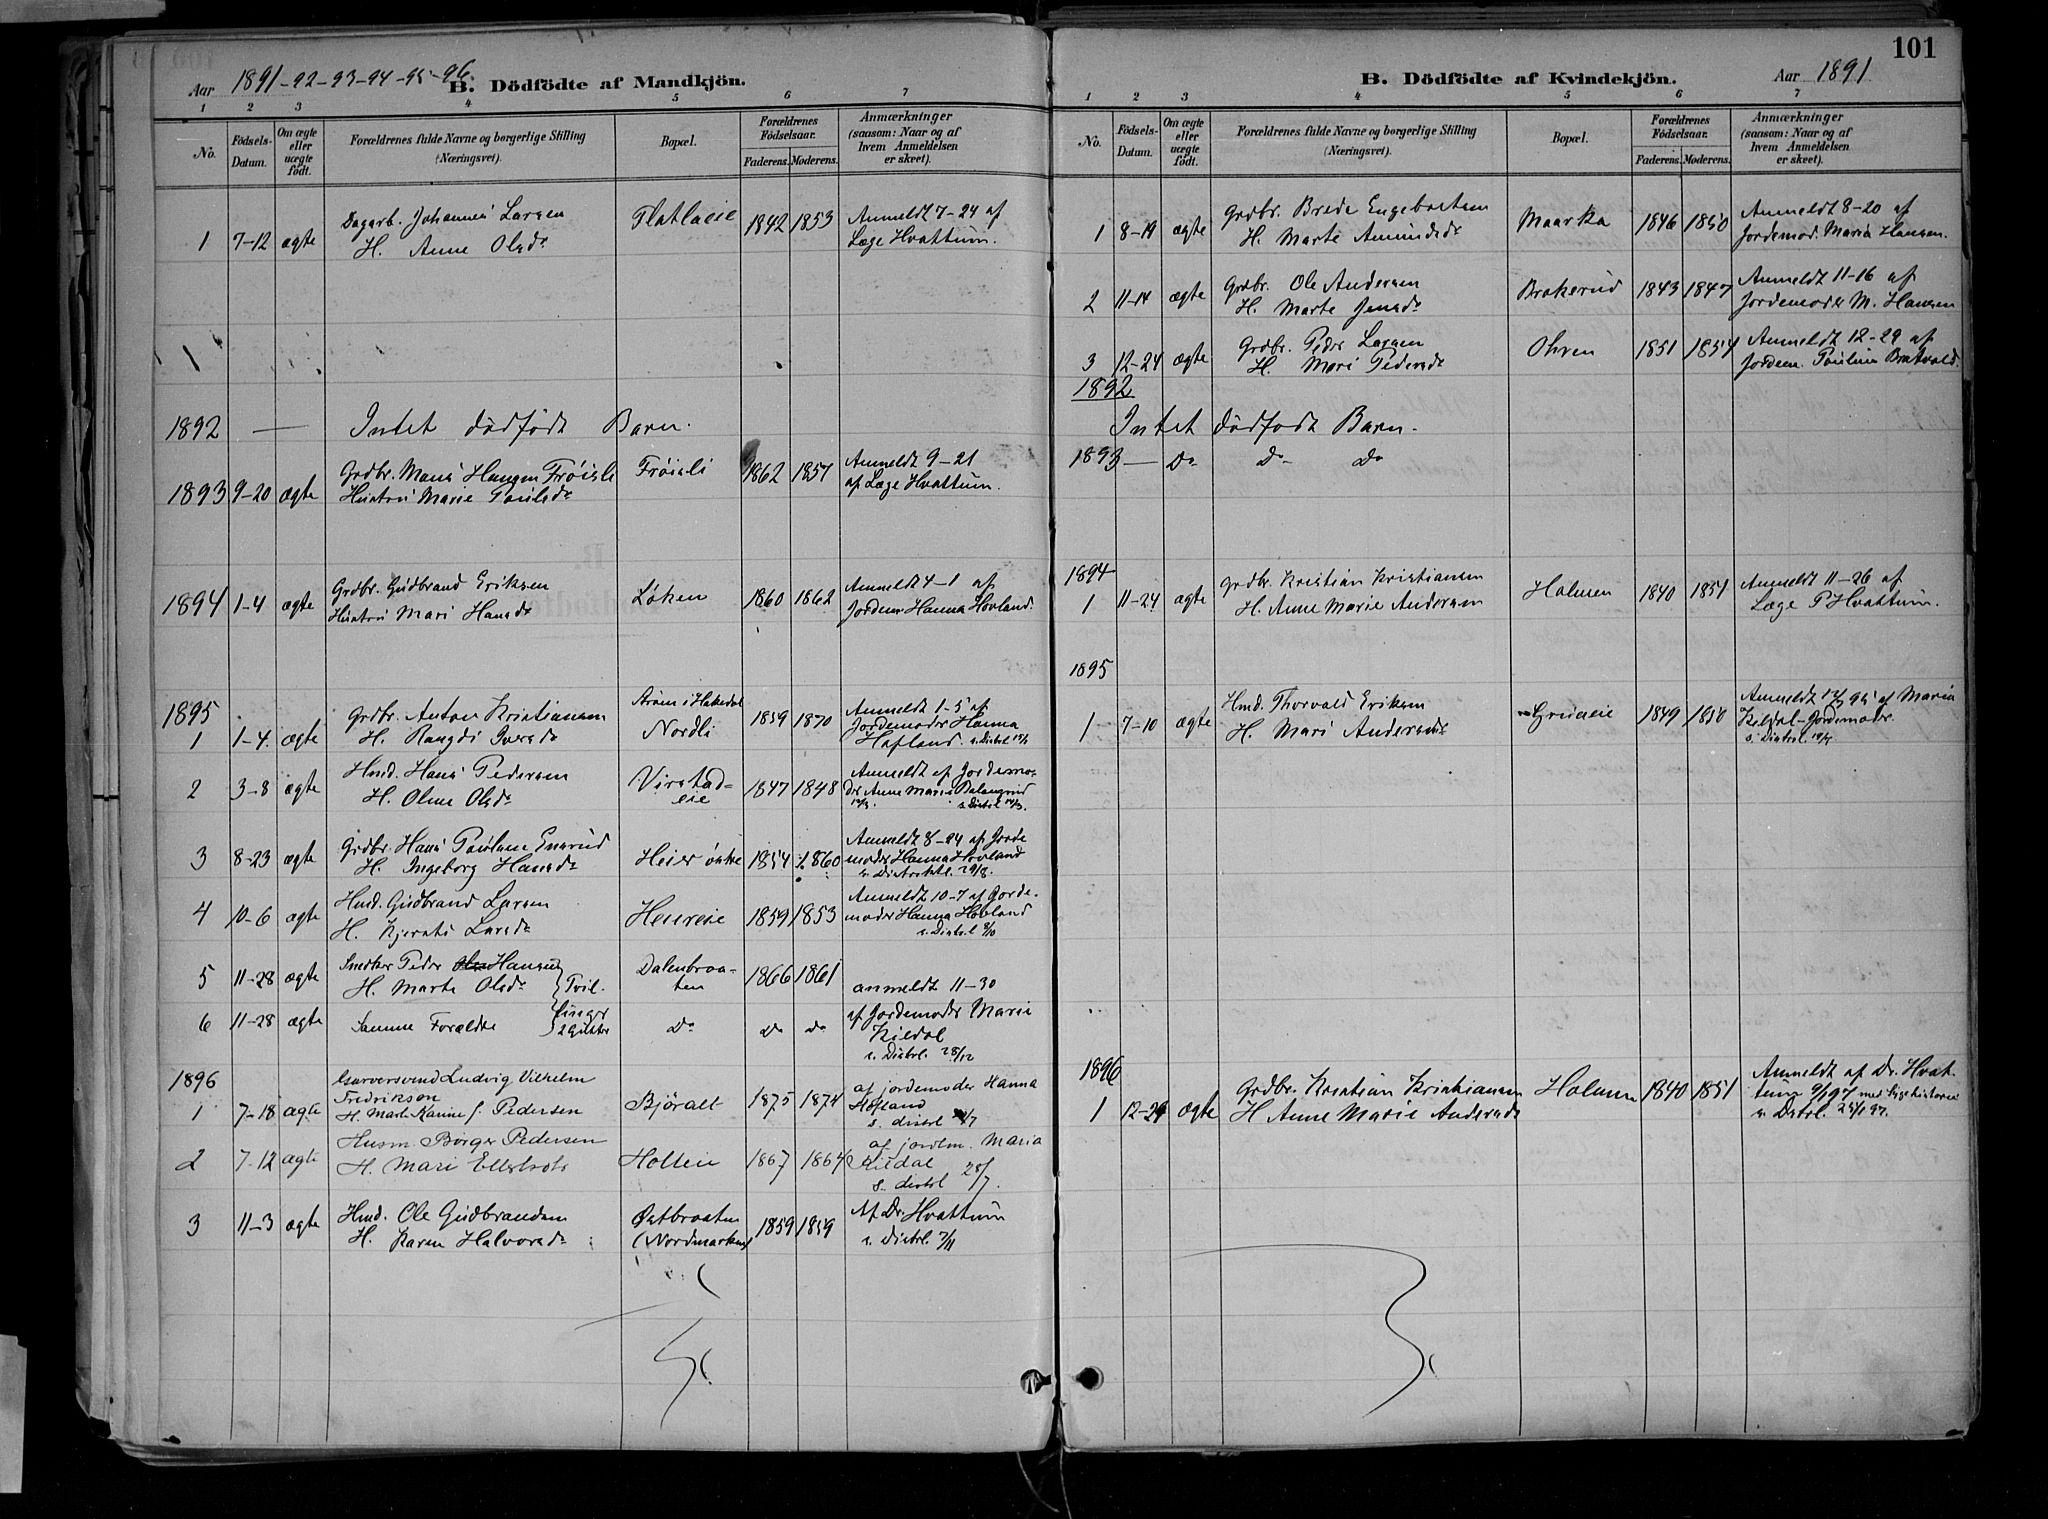 SAH, Jevnaker prestekontor, Ministerialbok nr. 10, 1891-1906, s. 101